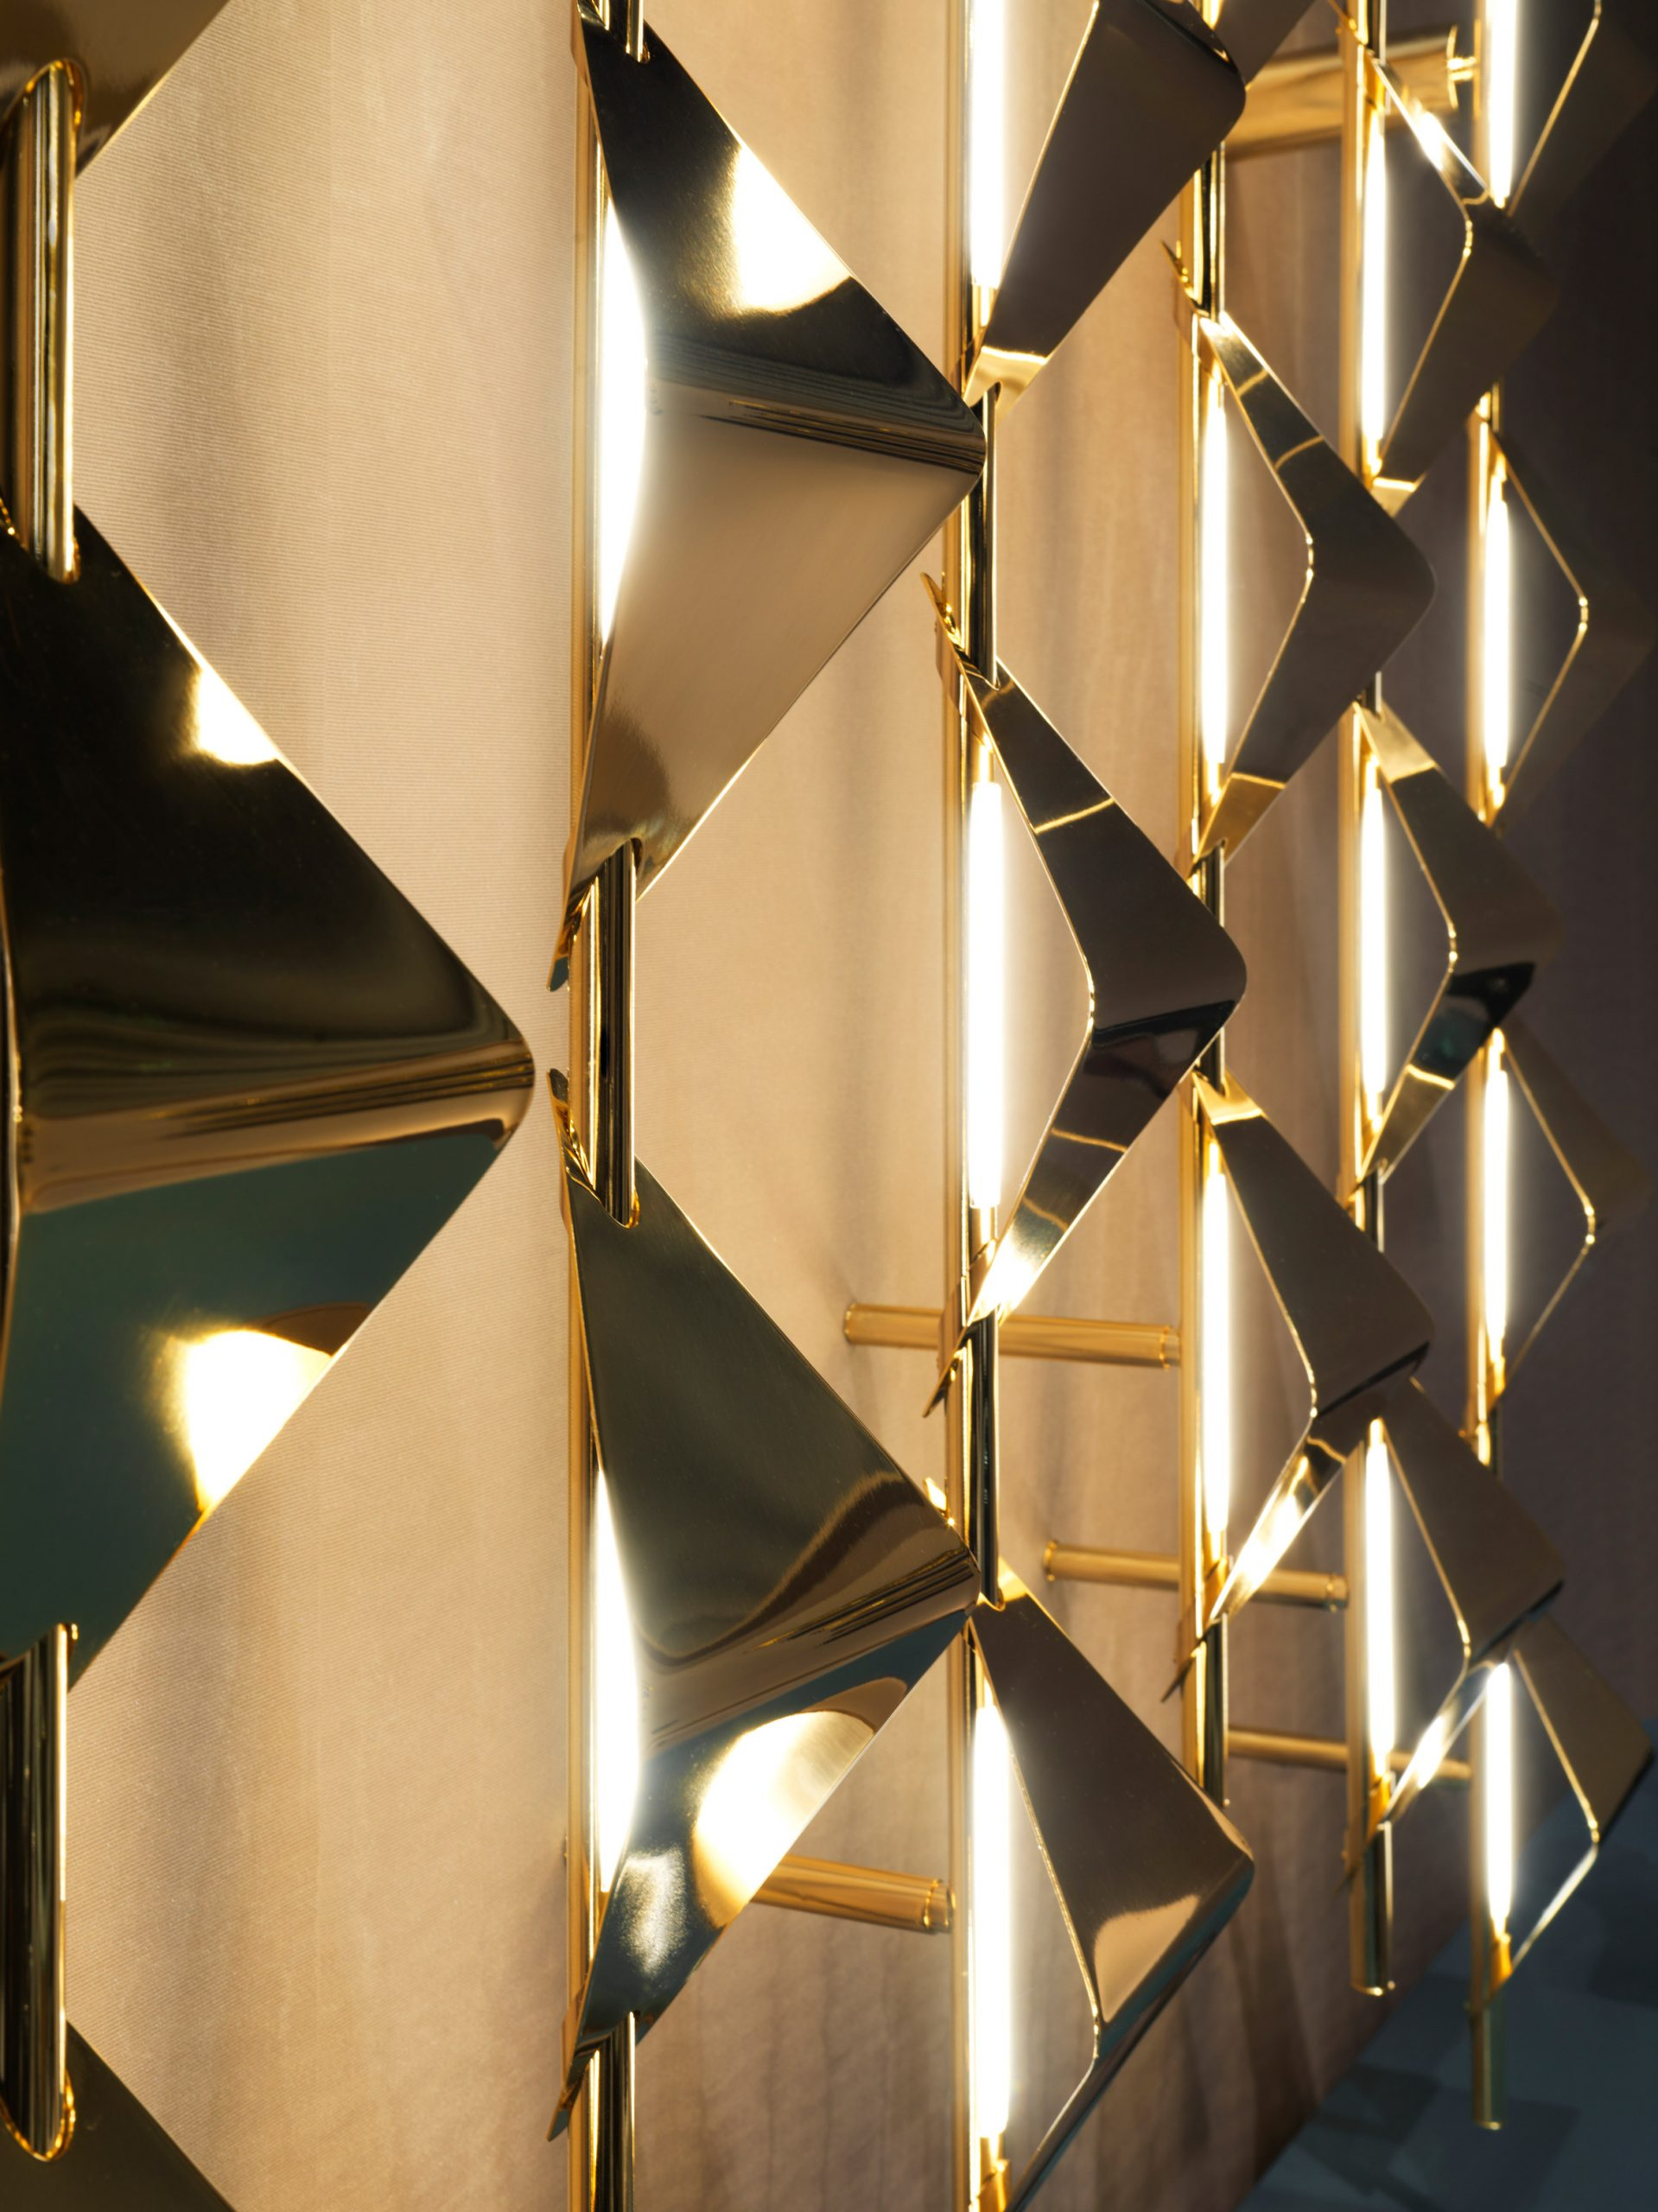 Draga & Aurel's Sputnik lights from Visionnaire's Beauty collection